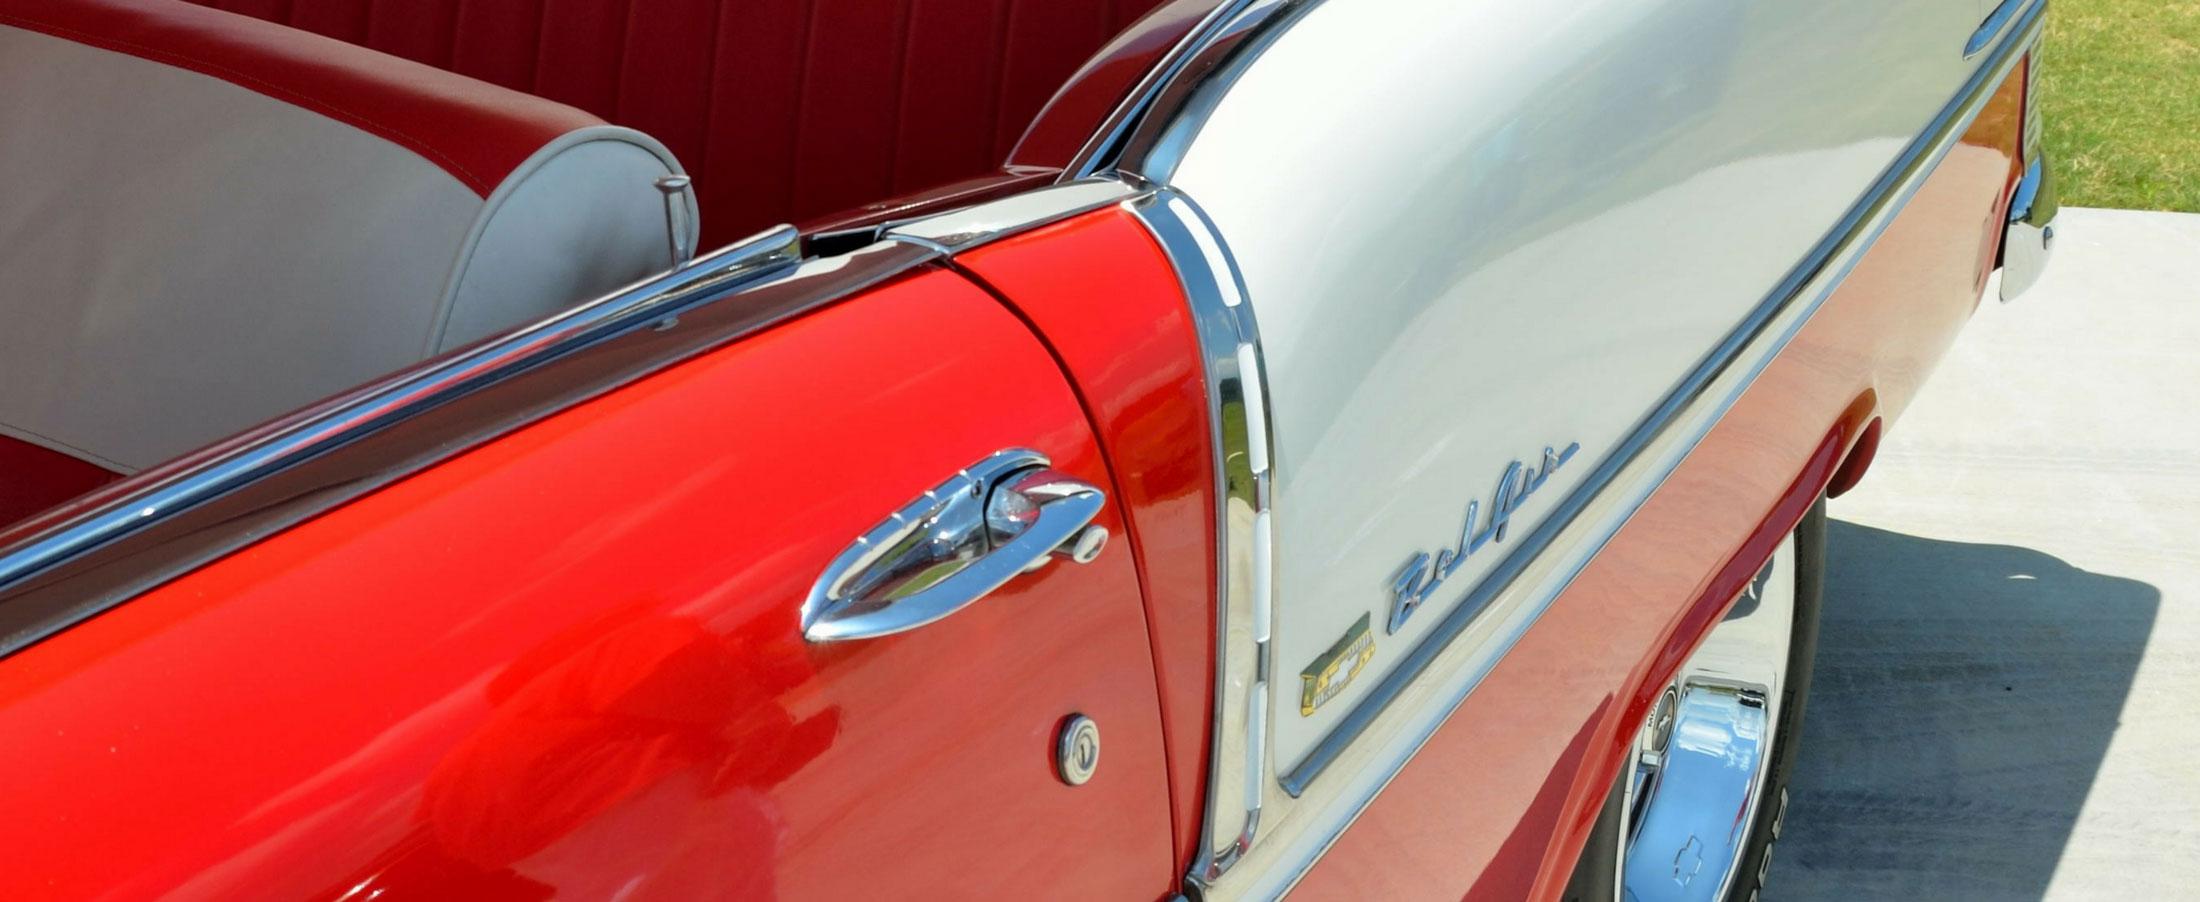 Classic Chevrolet BelAir